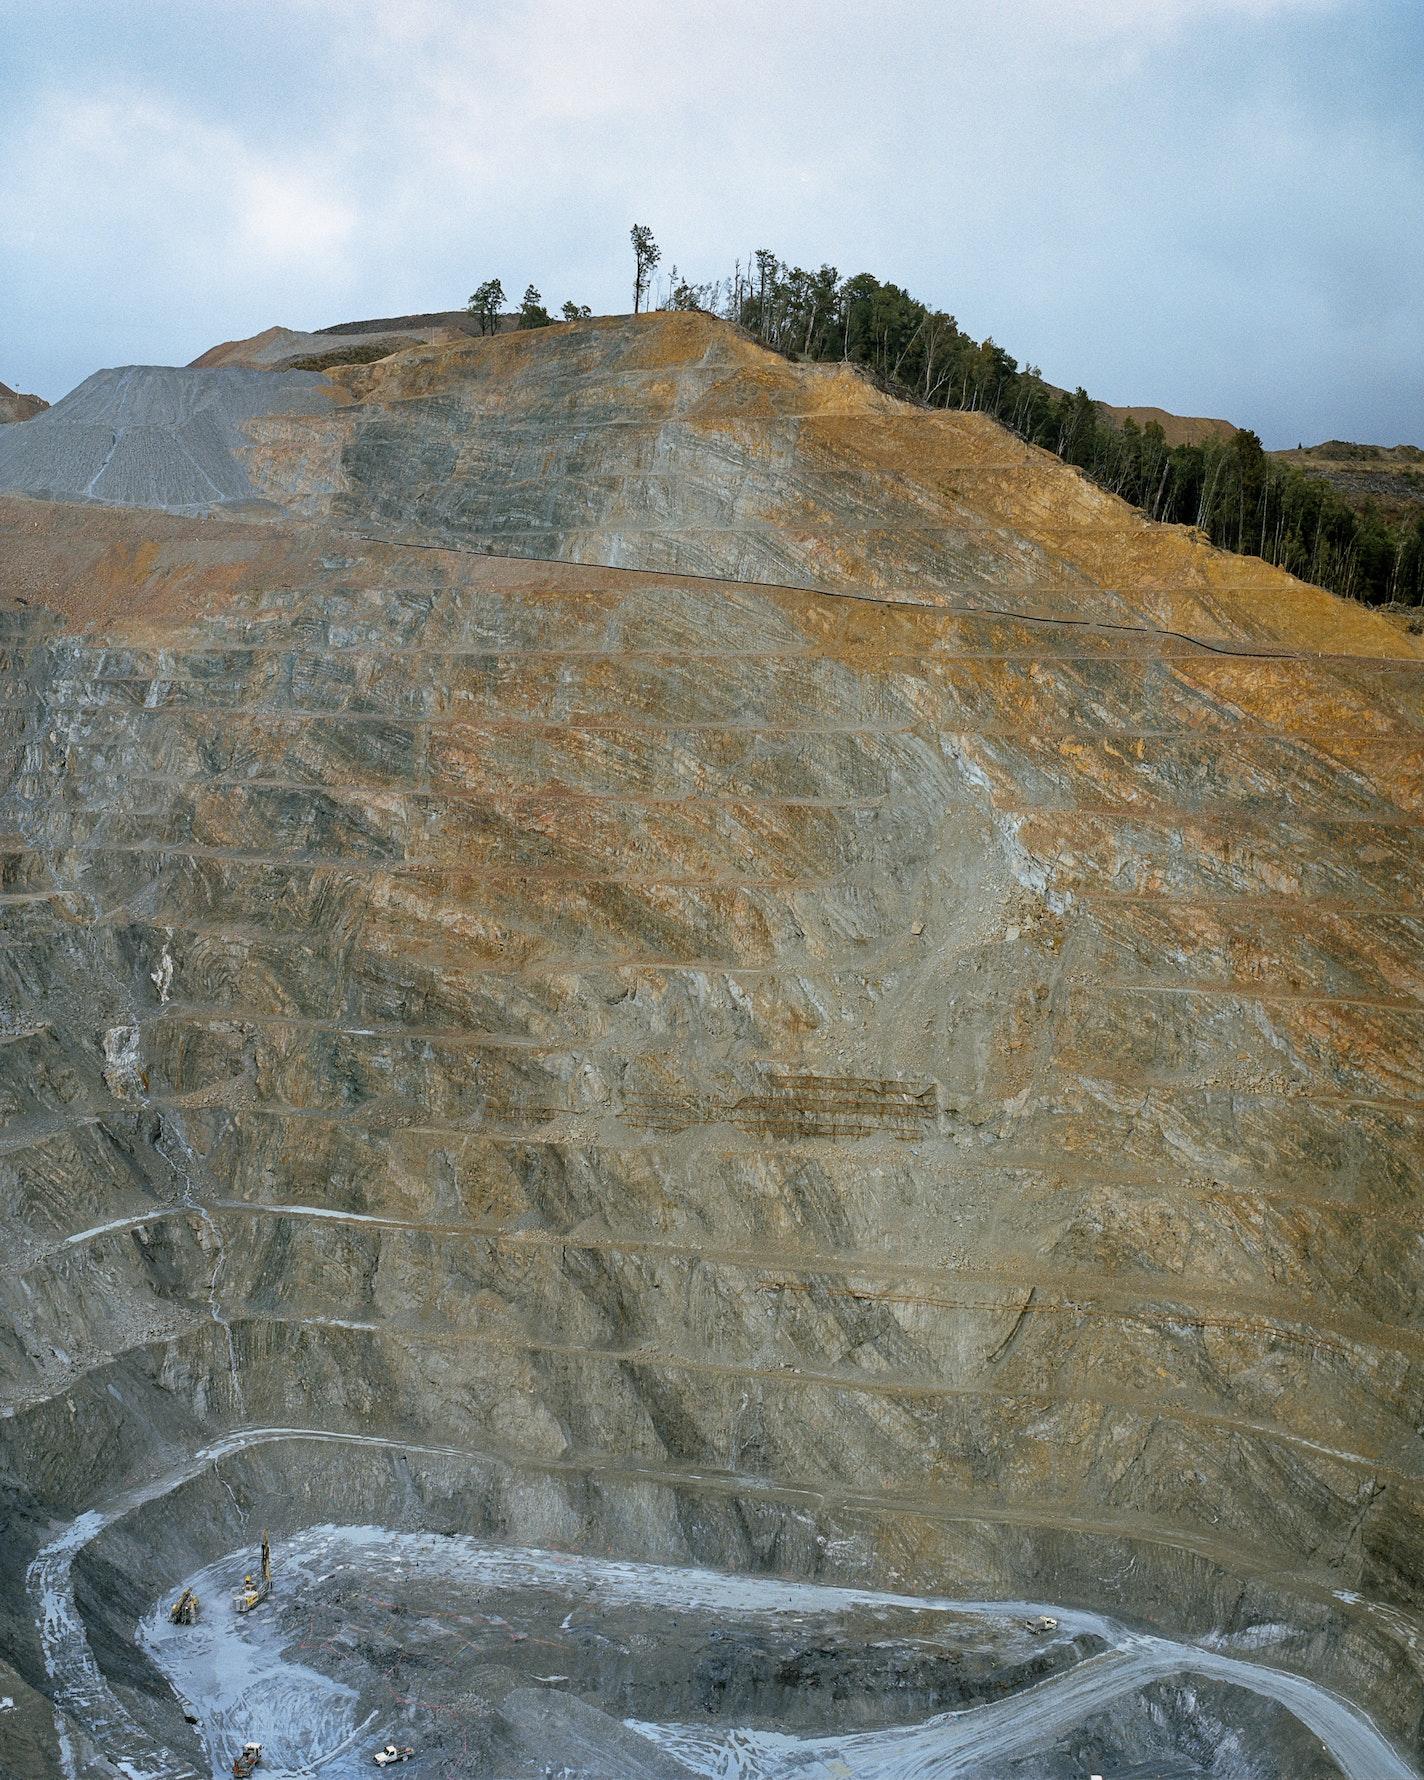 Oceania Gold Mine, Reefton